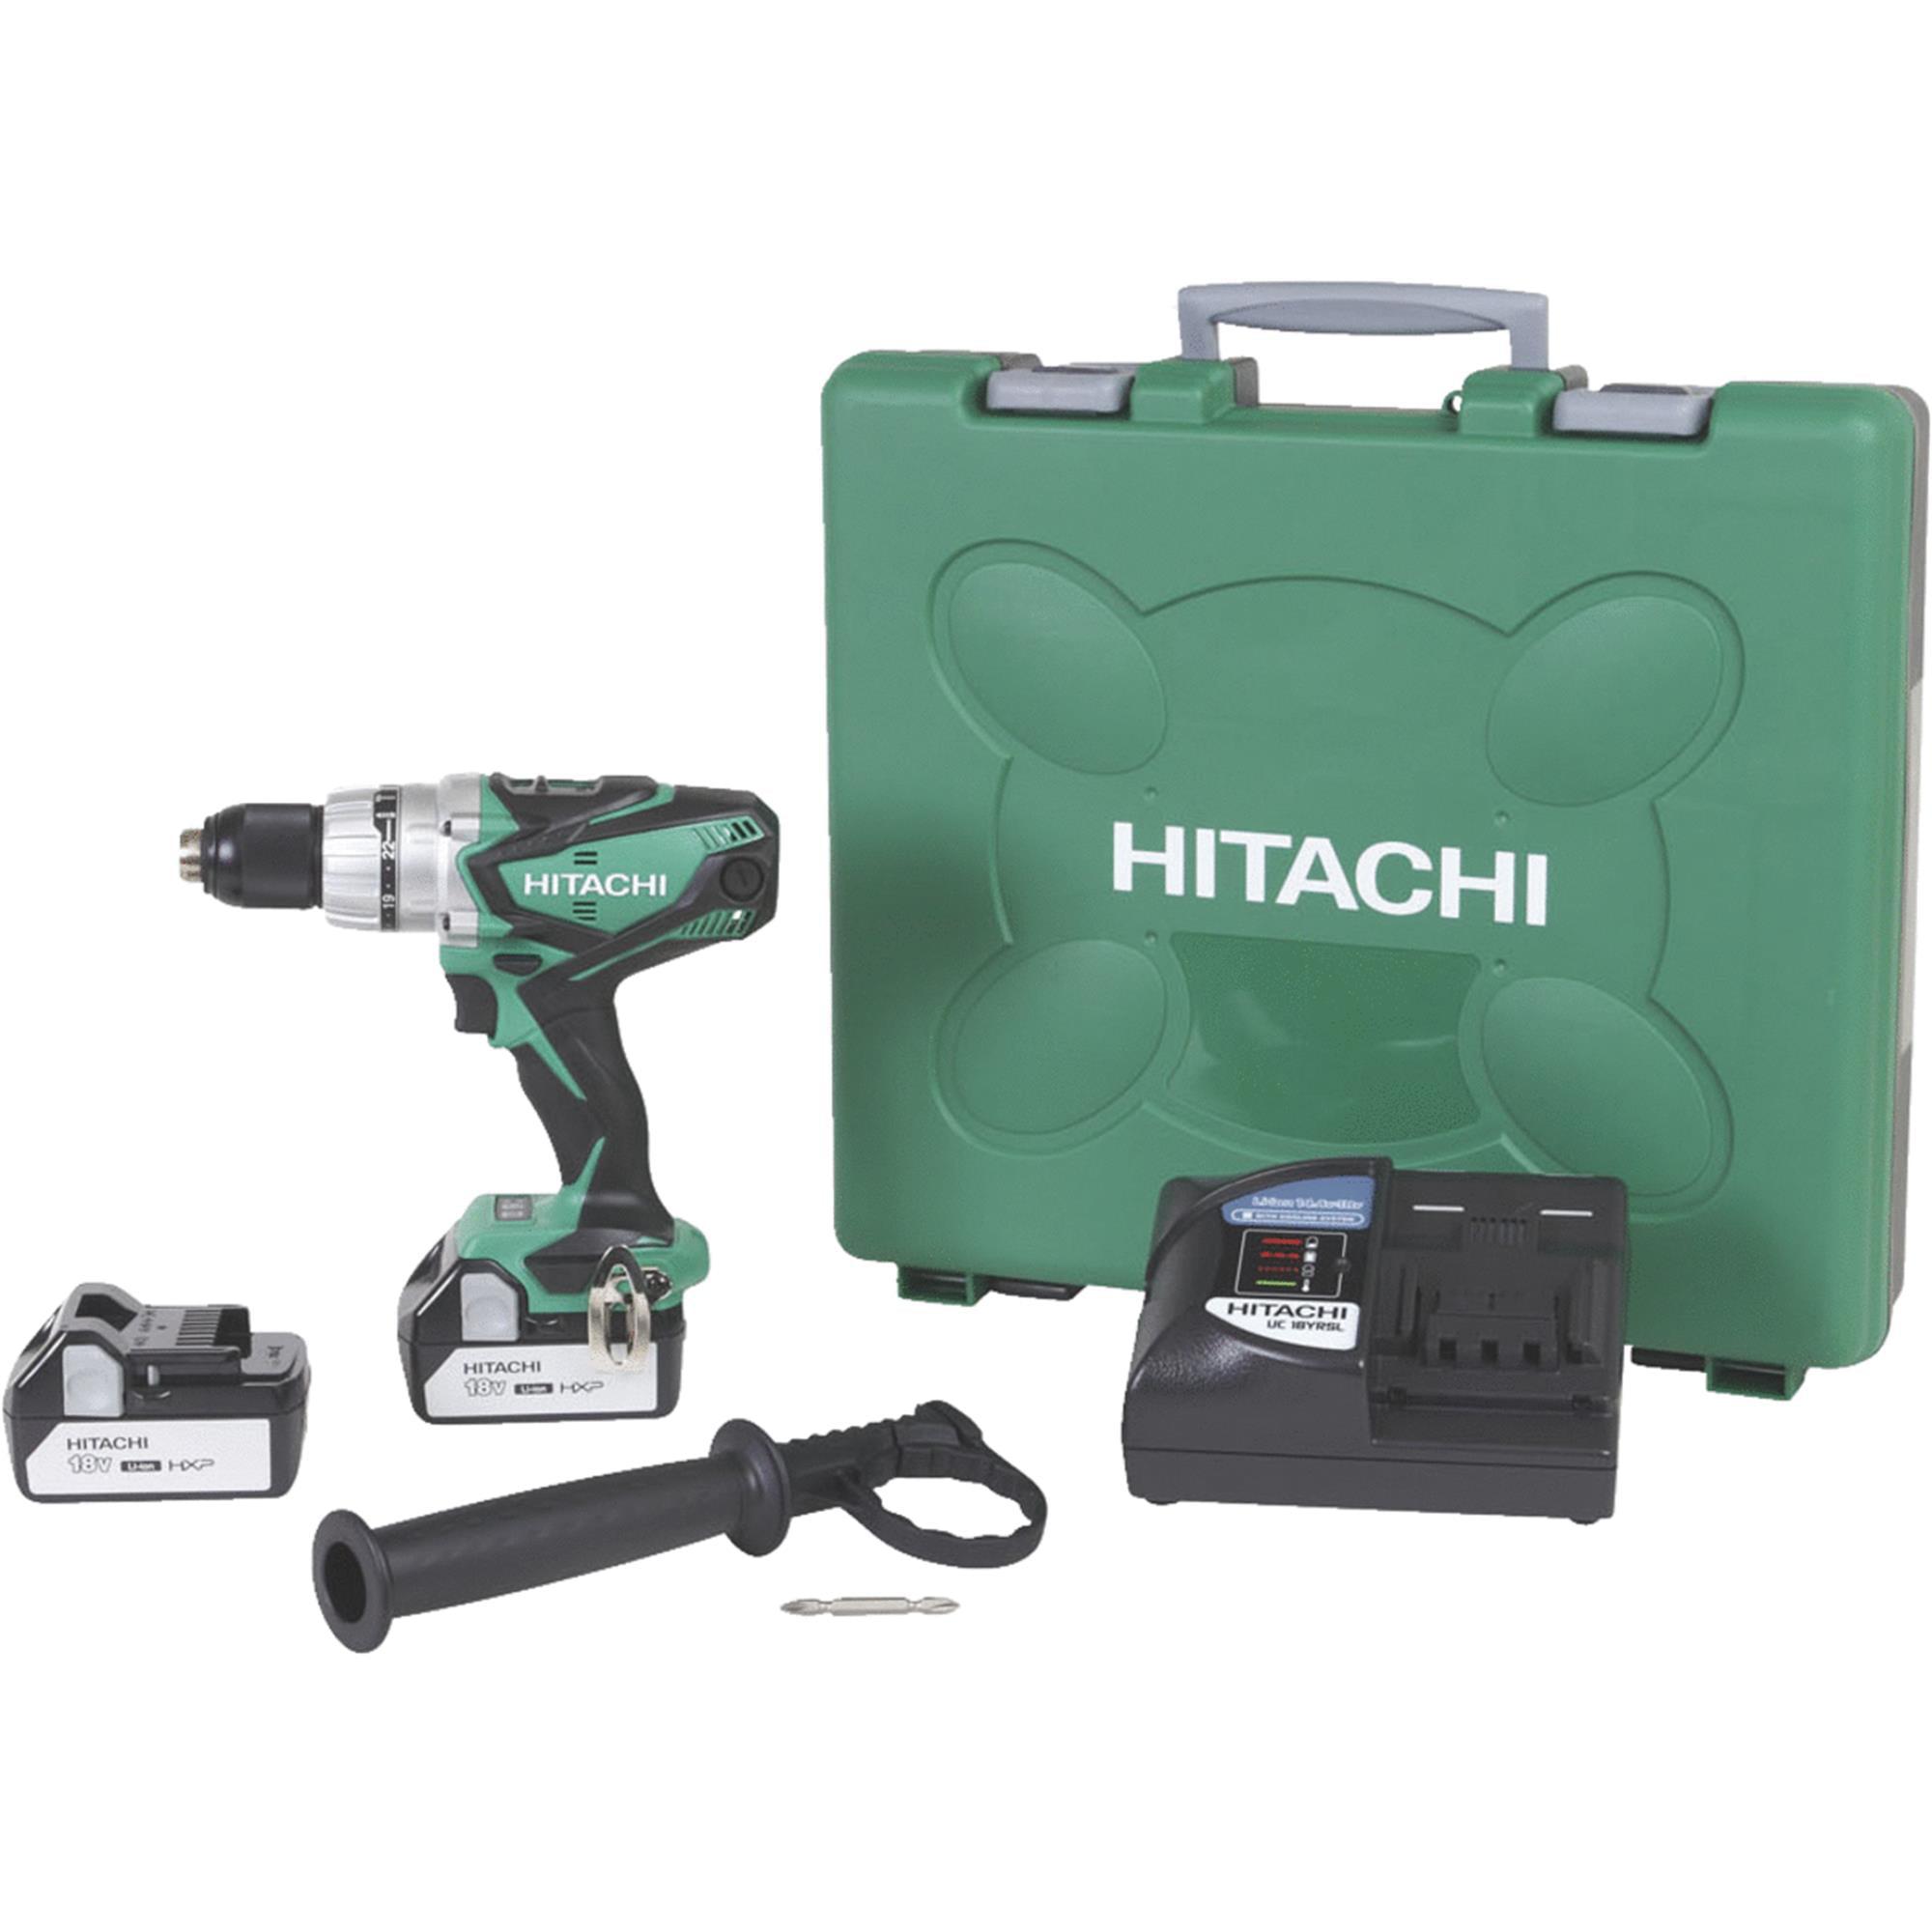 Hitachi 18v Lithium Ion Cordless Hammer Drill Kit Walmart Com